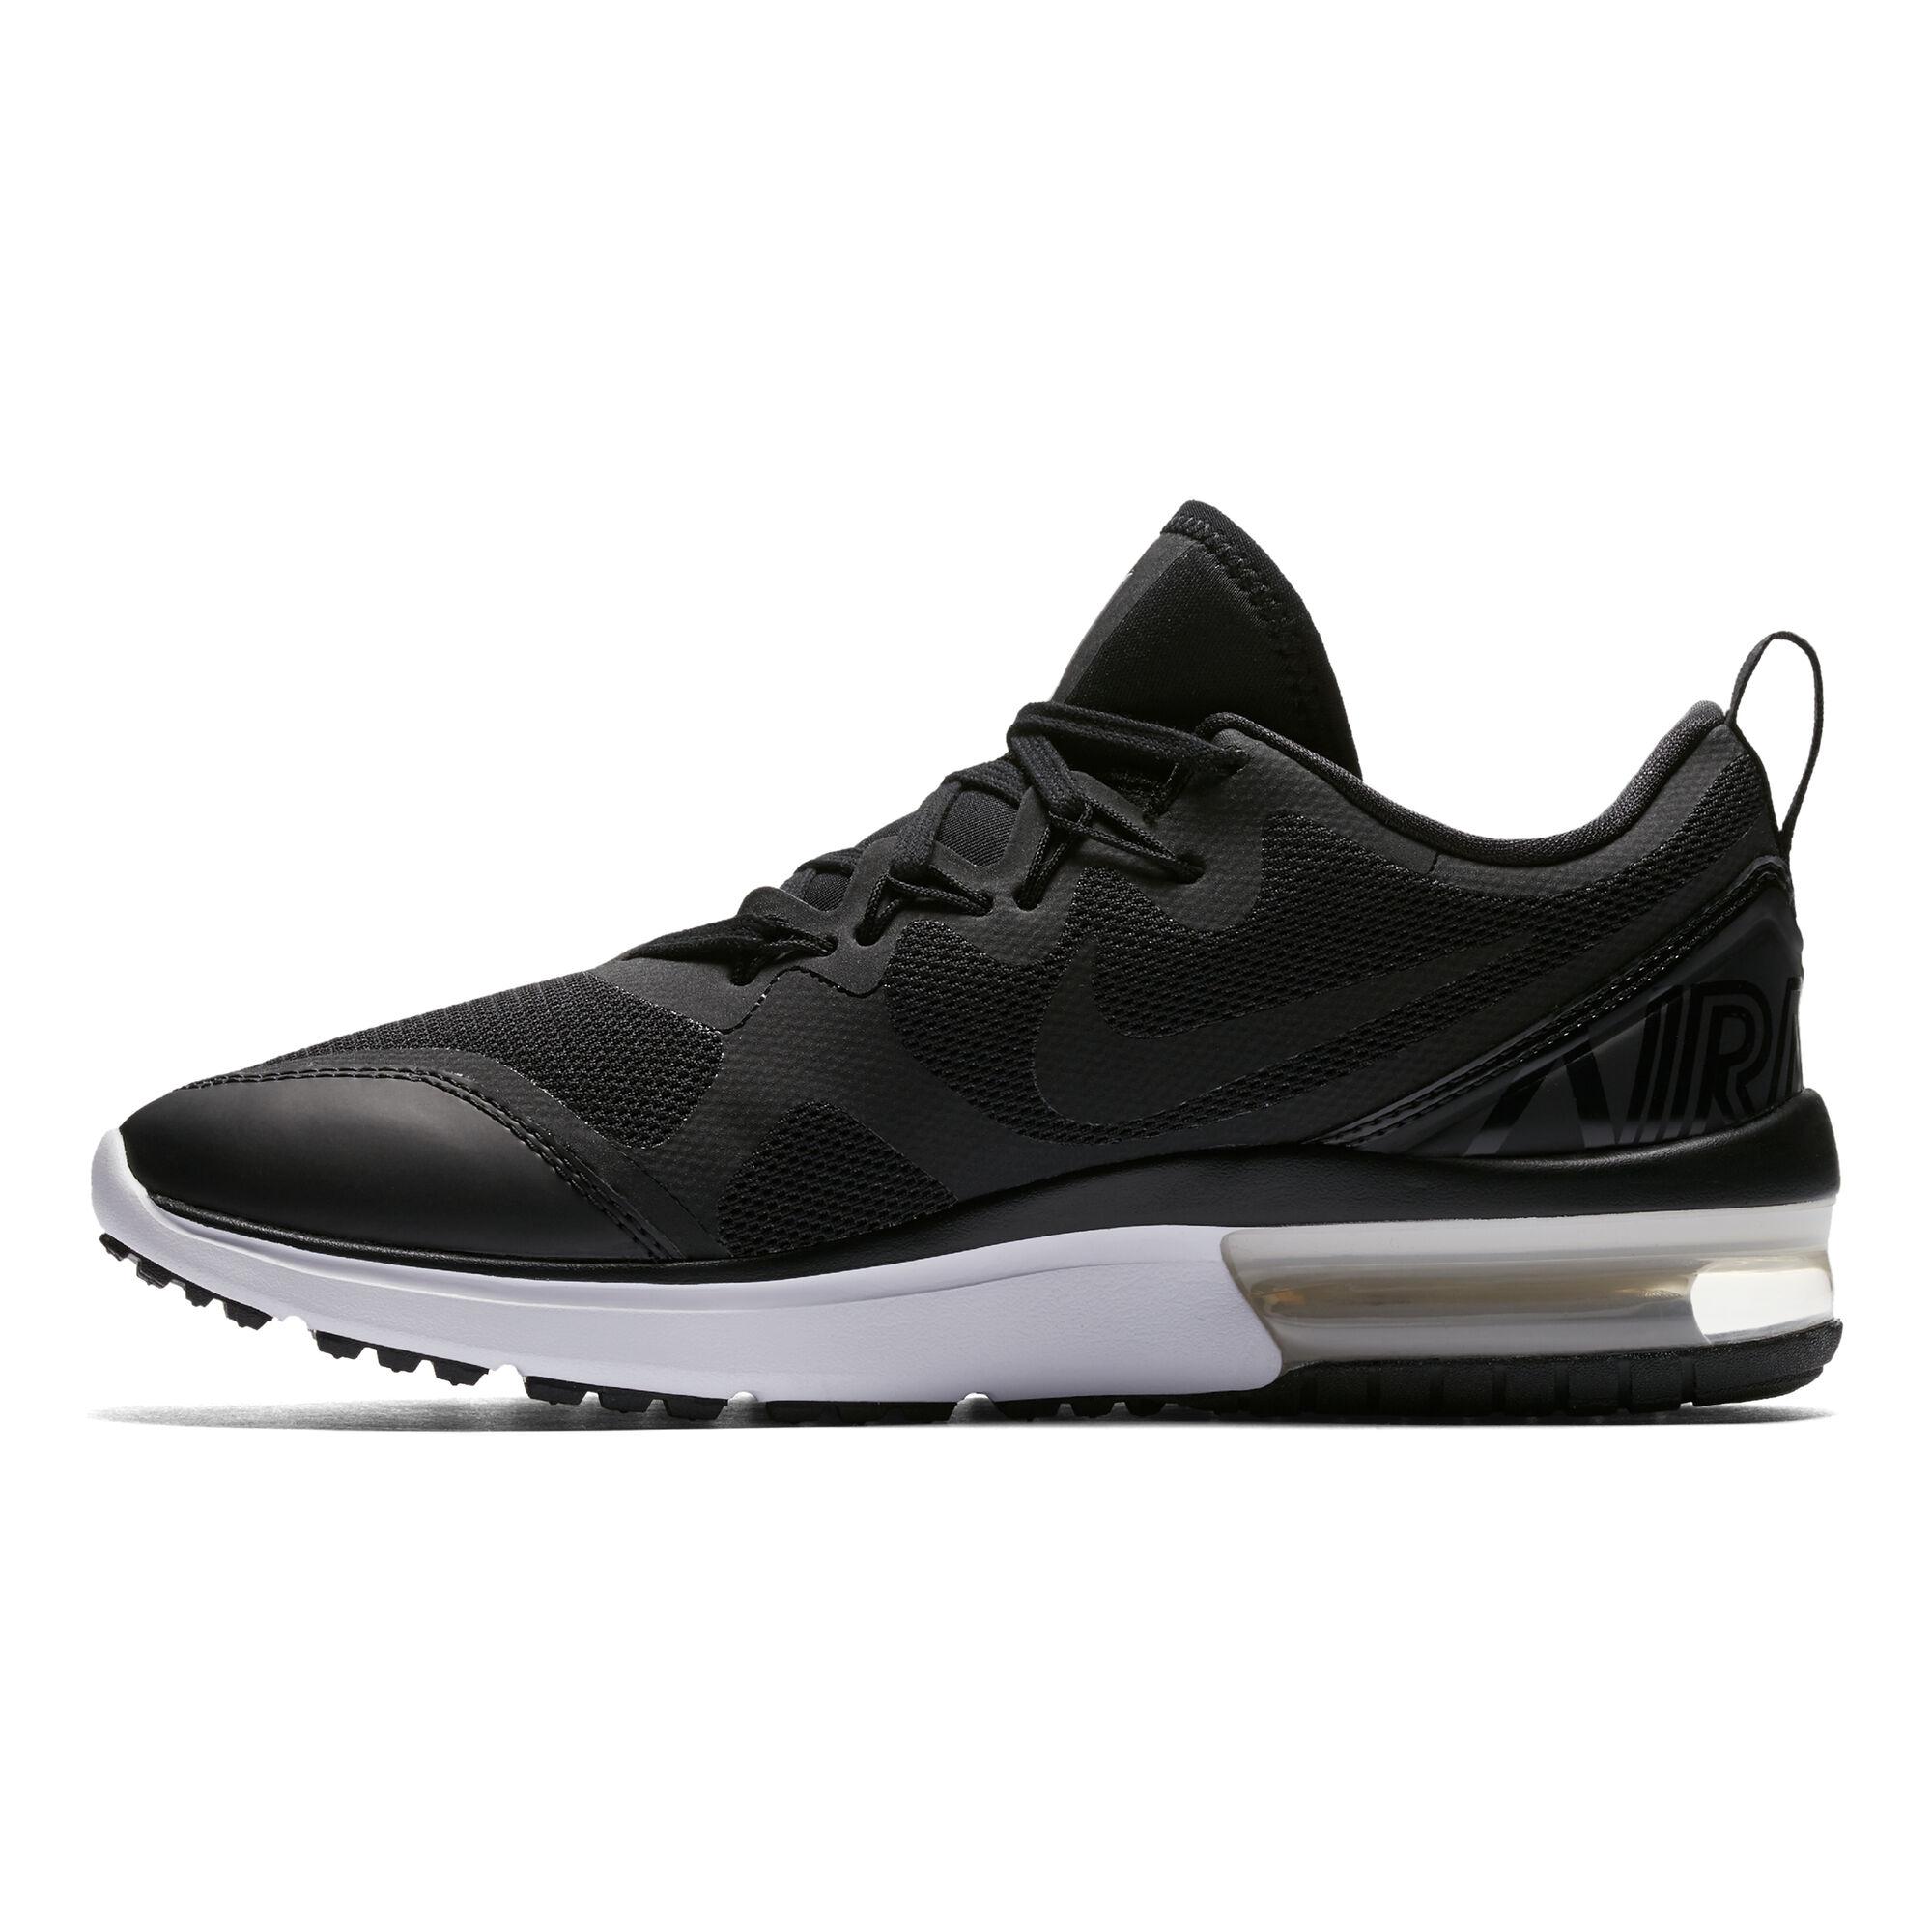 2ec5d9418333 Nike · Nike · Nike · Nike · Nike · Nike · Nike · Nike · Nike · Nike. Air  Max Fury ...